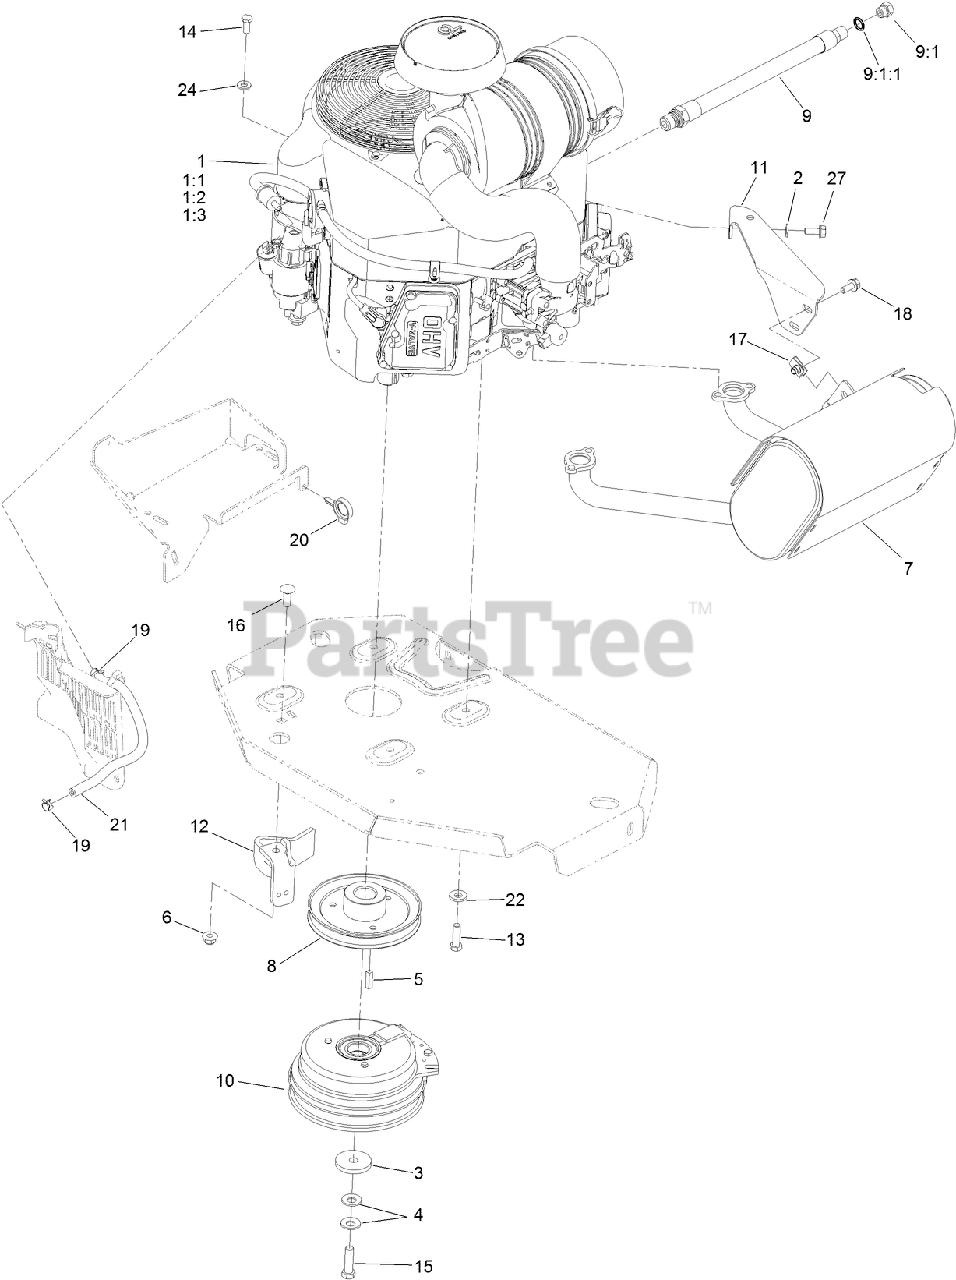 Amazon.com: Toro OEM Replacement Belt 99-4647 5/8x142, FITS...